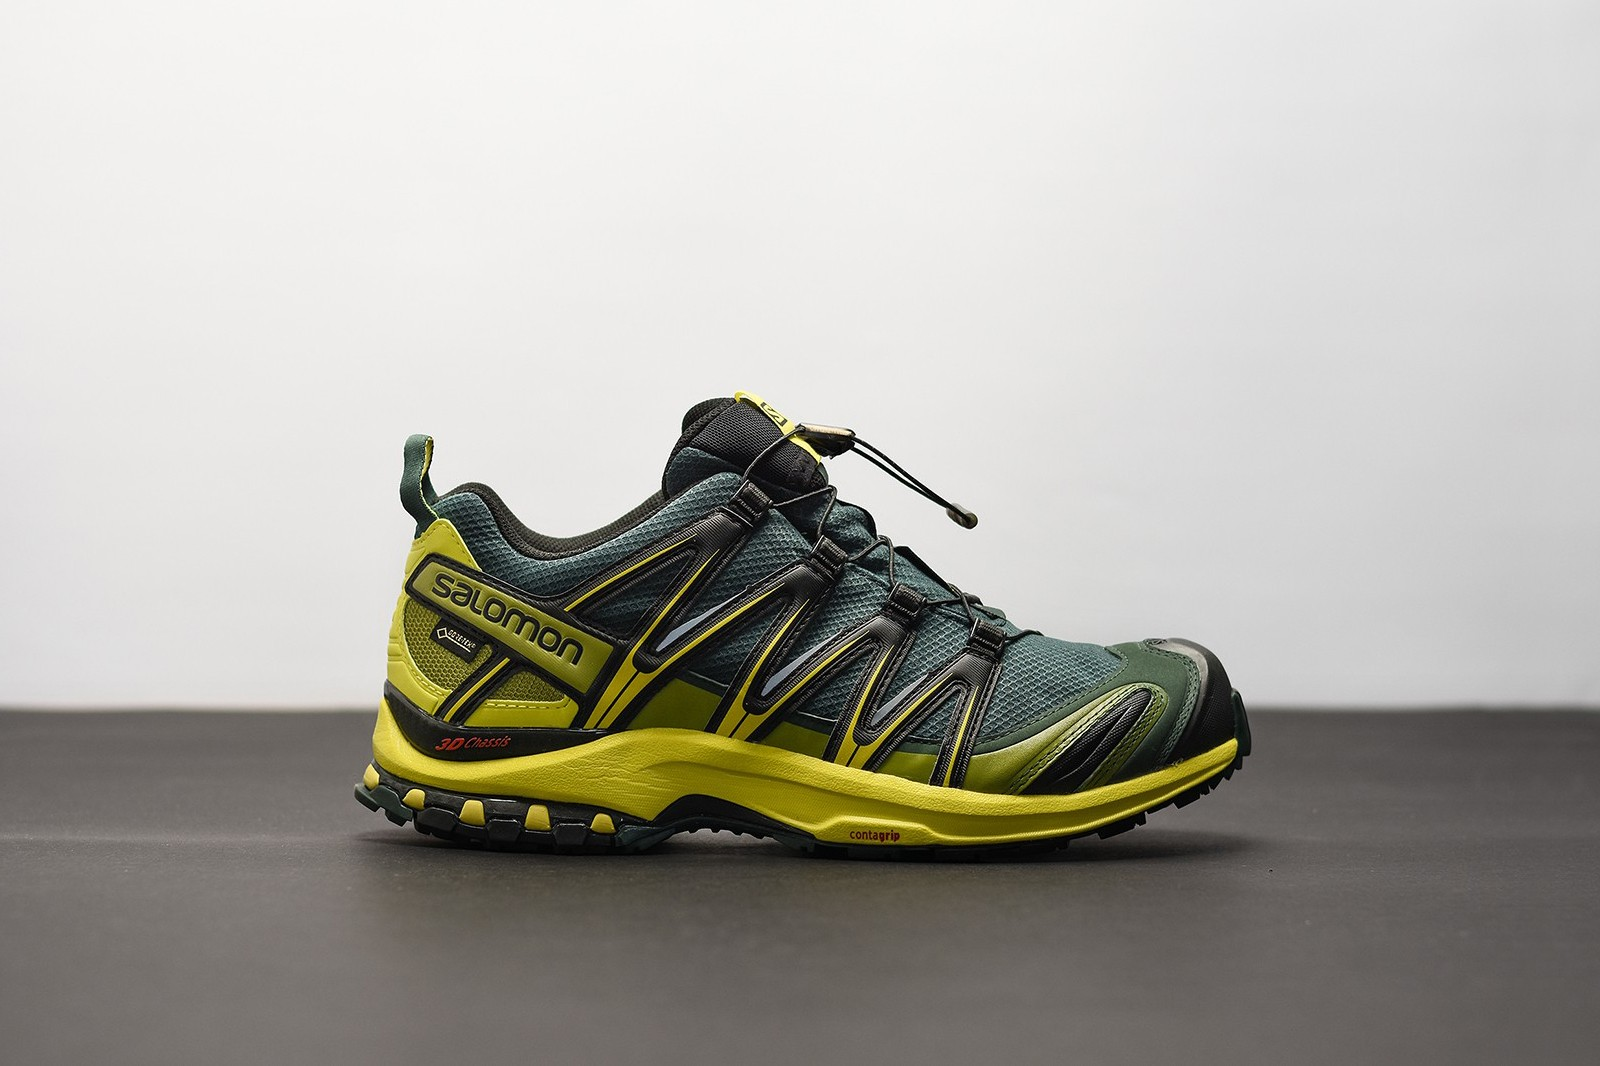 Pánské Běžecké boty Salomon XA PRO 3D GTXR Darkest Sp Sulp  f37f9fb772